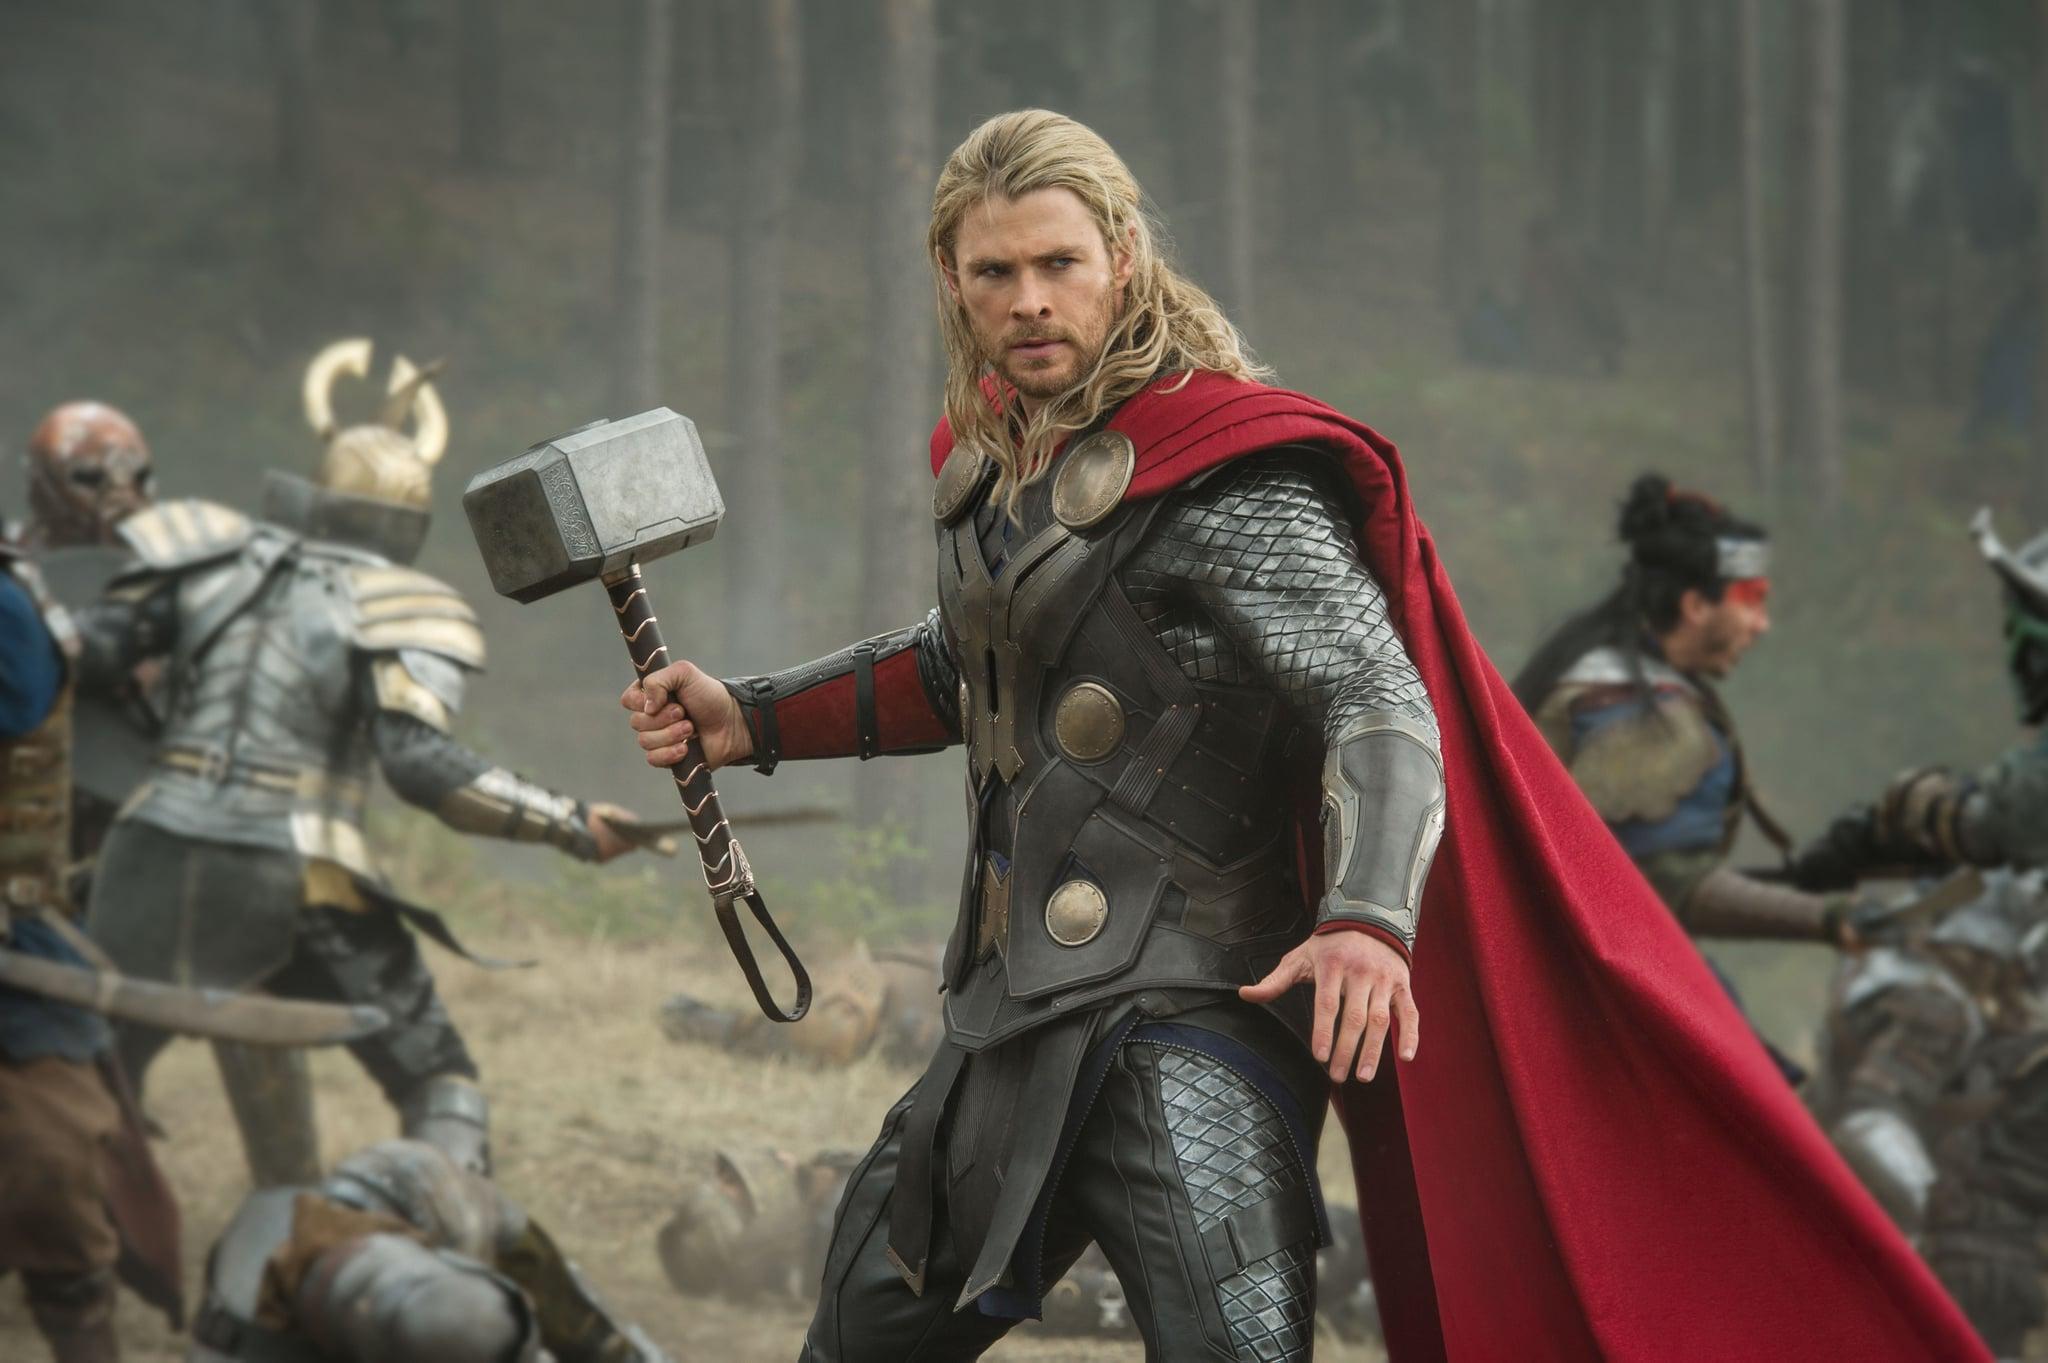 THOR: THE DARK WORLD, Chris Hemsworth as Thor, 2013. ph: Jay Maidment/Walt Disney Studios/courtesy Everett Collection